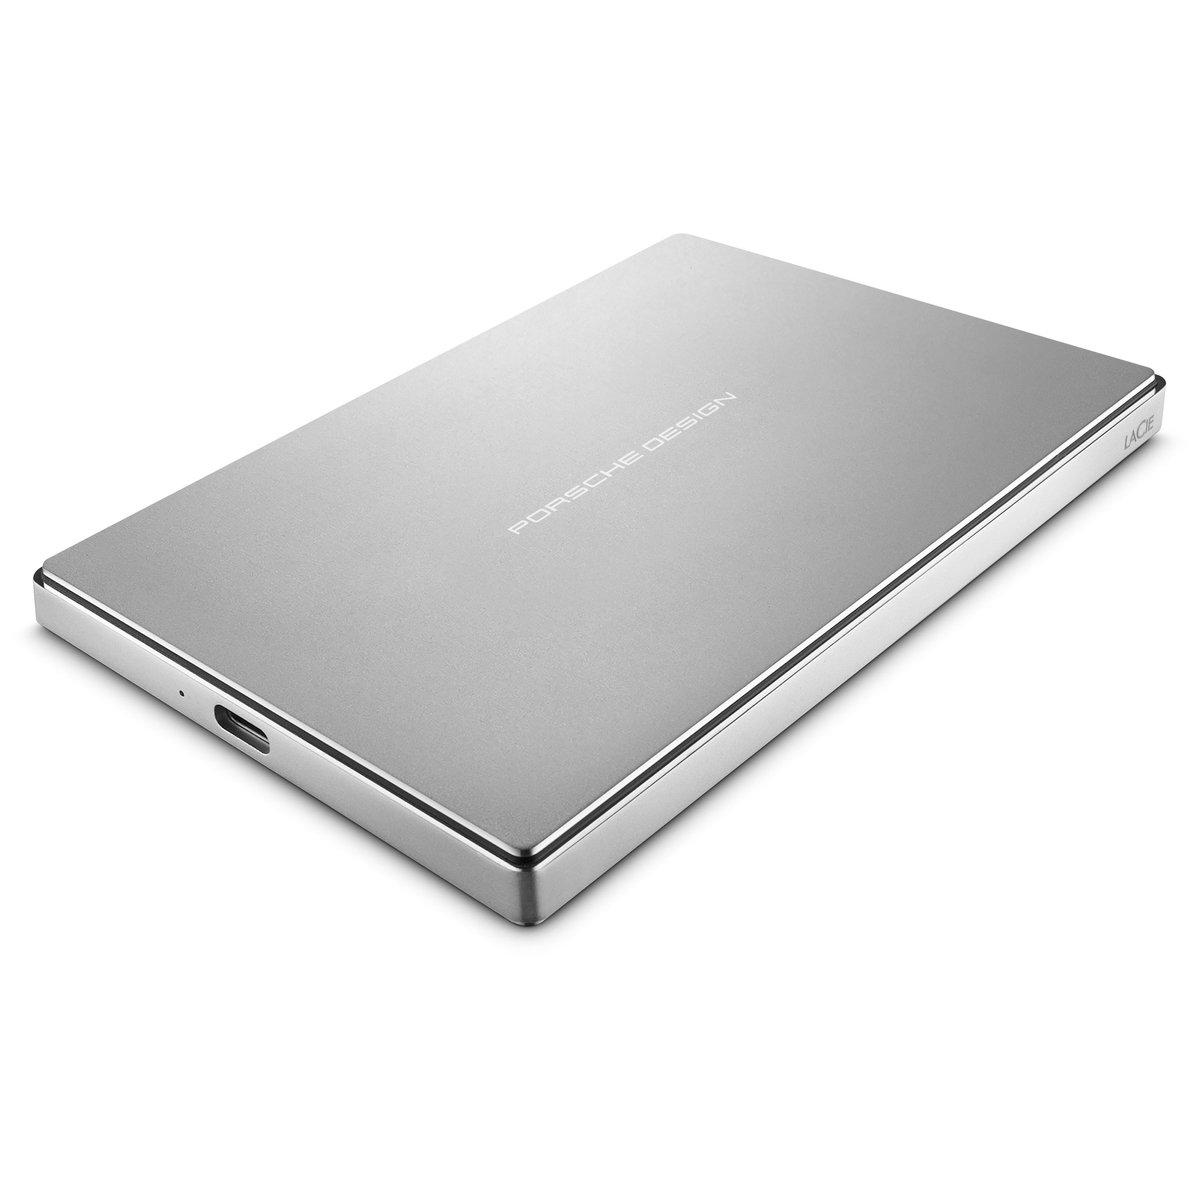 LaCie Porsche Design 2TB USB-C Mobile Hard Drive, Silver + 2mo Adobe CC Photography (STFD2000400)